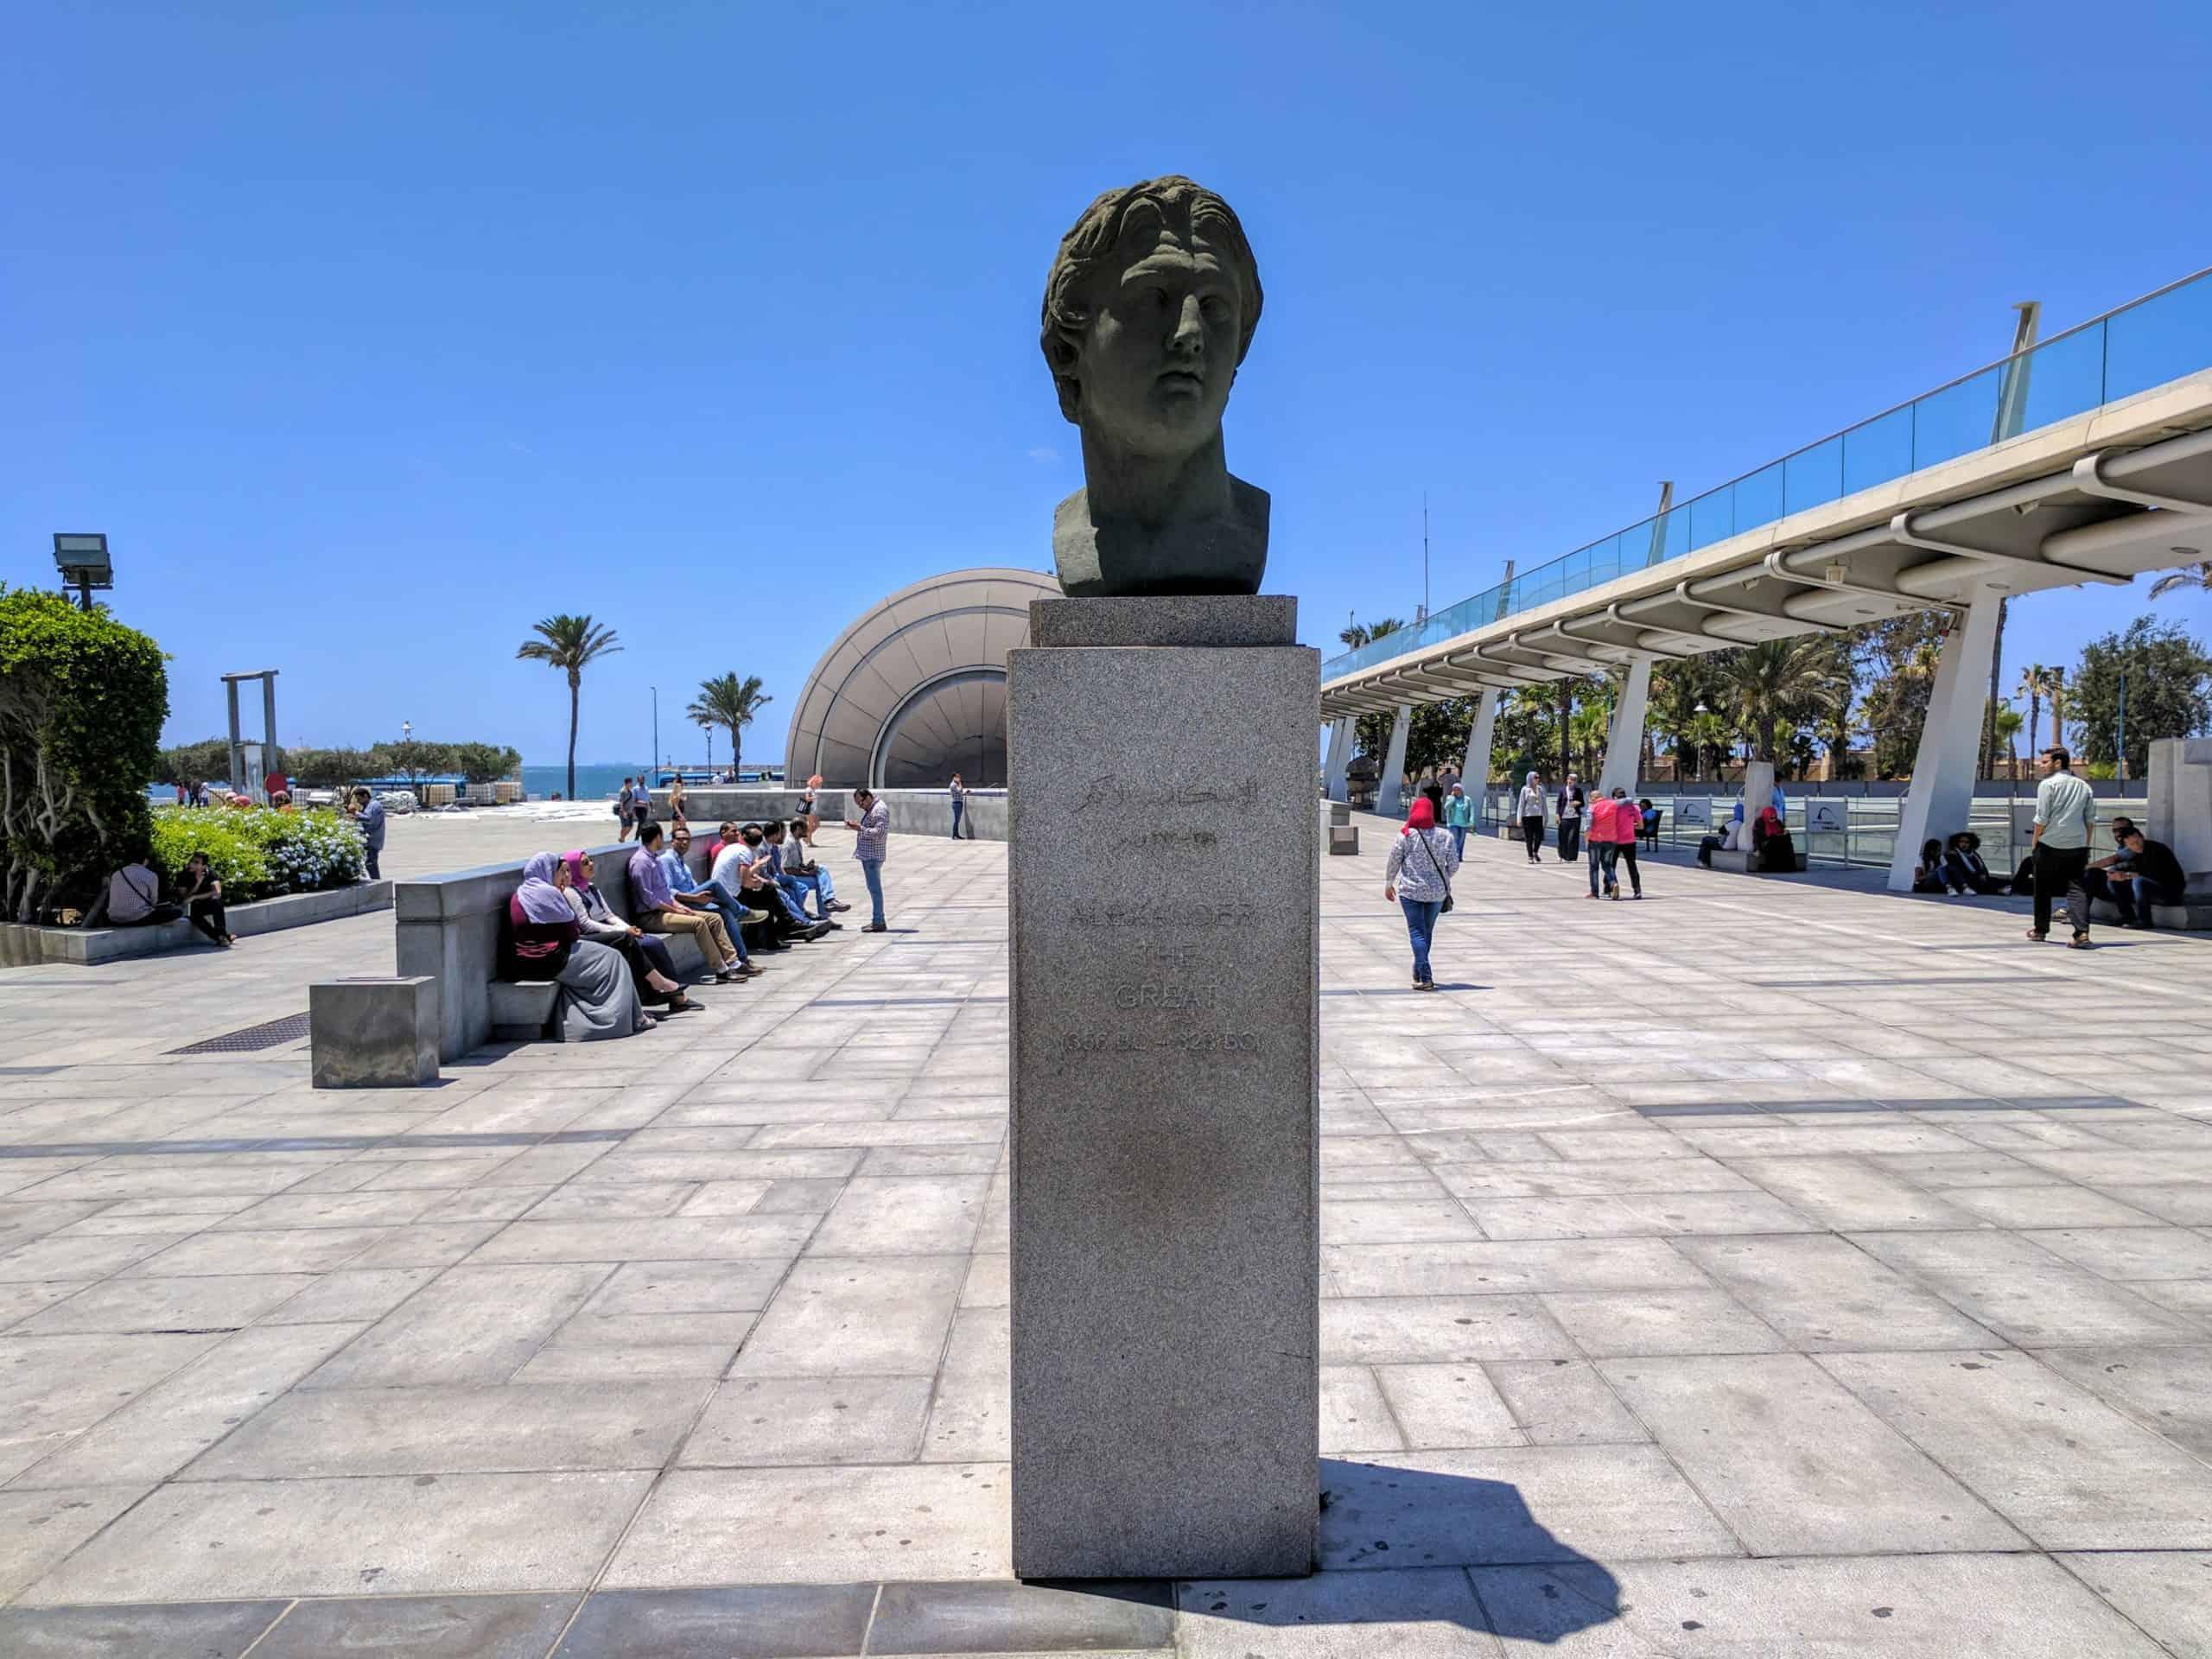 Busto de Alexandre, o Grande na Biblioteca de Alexandria.